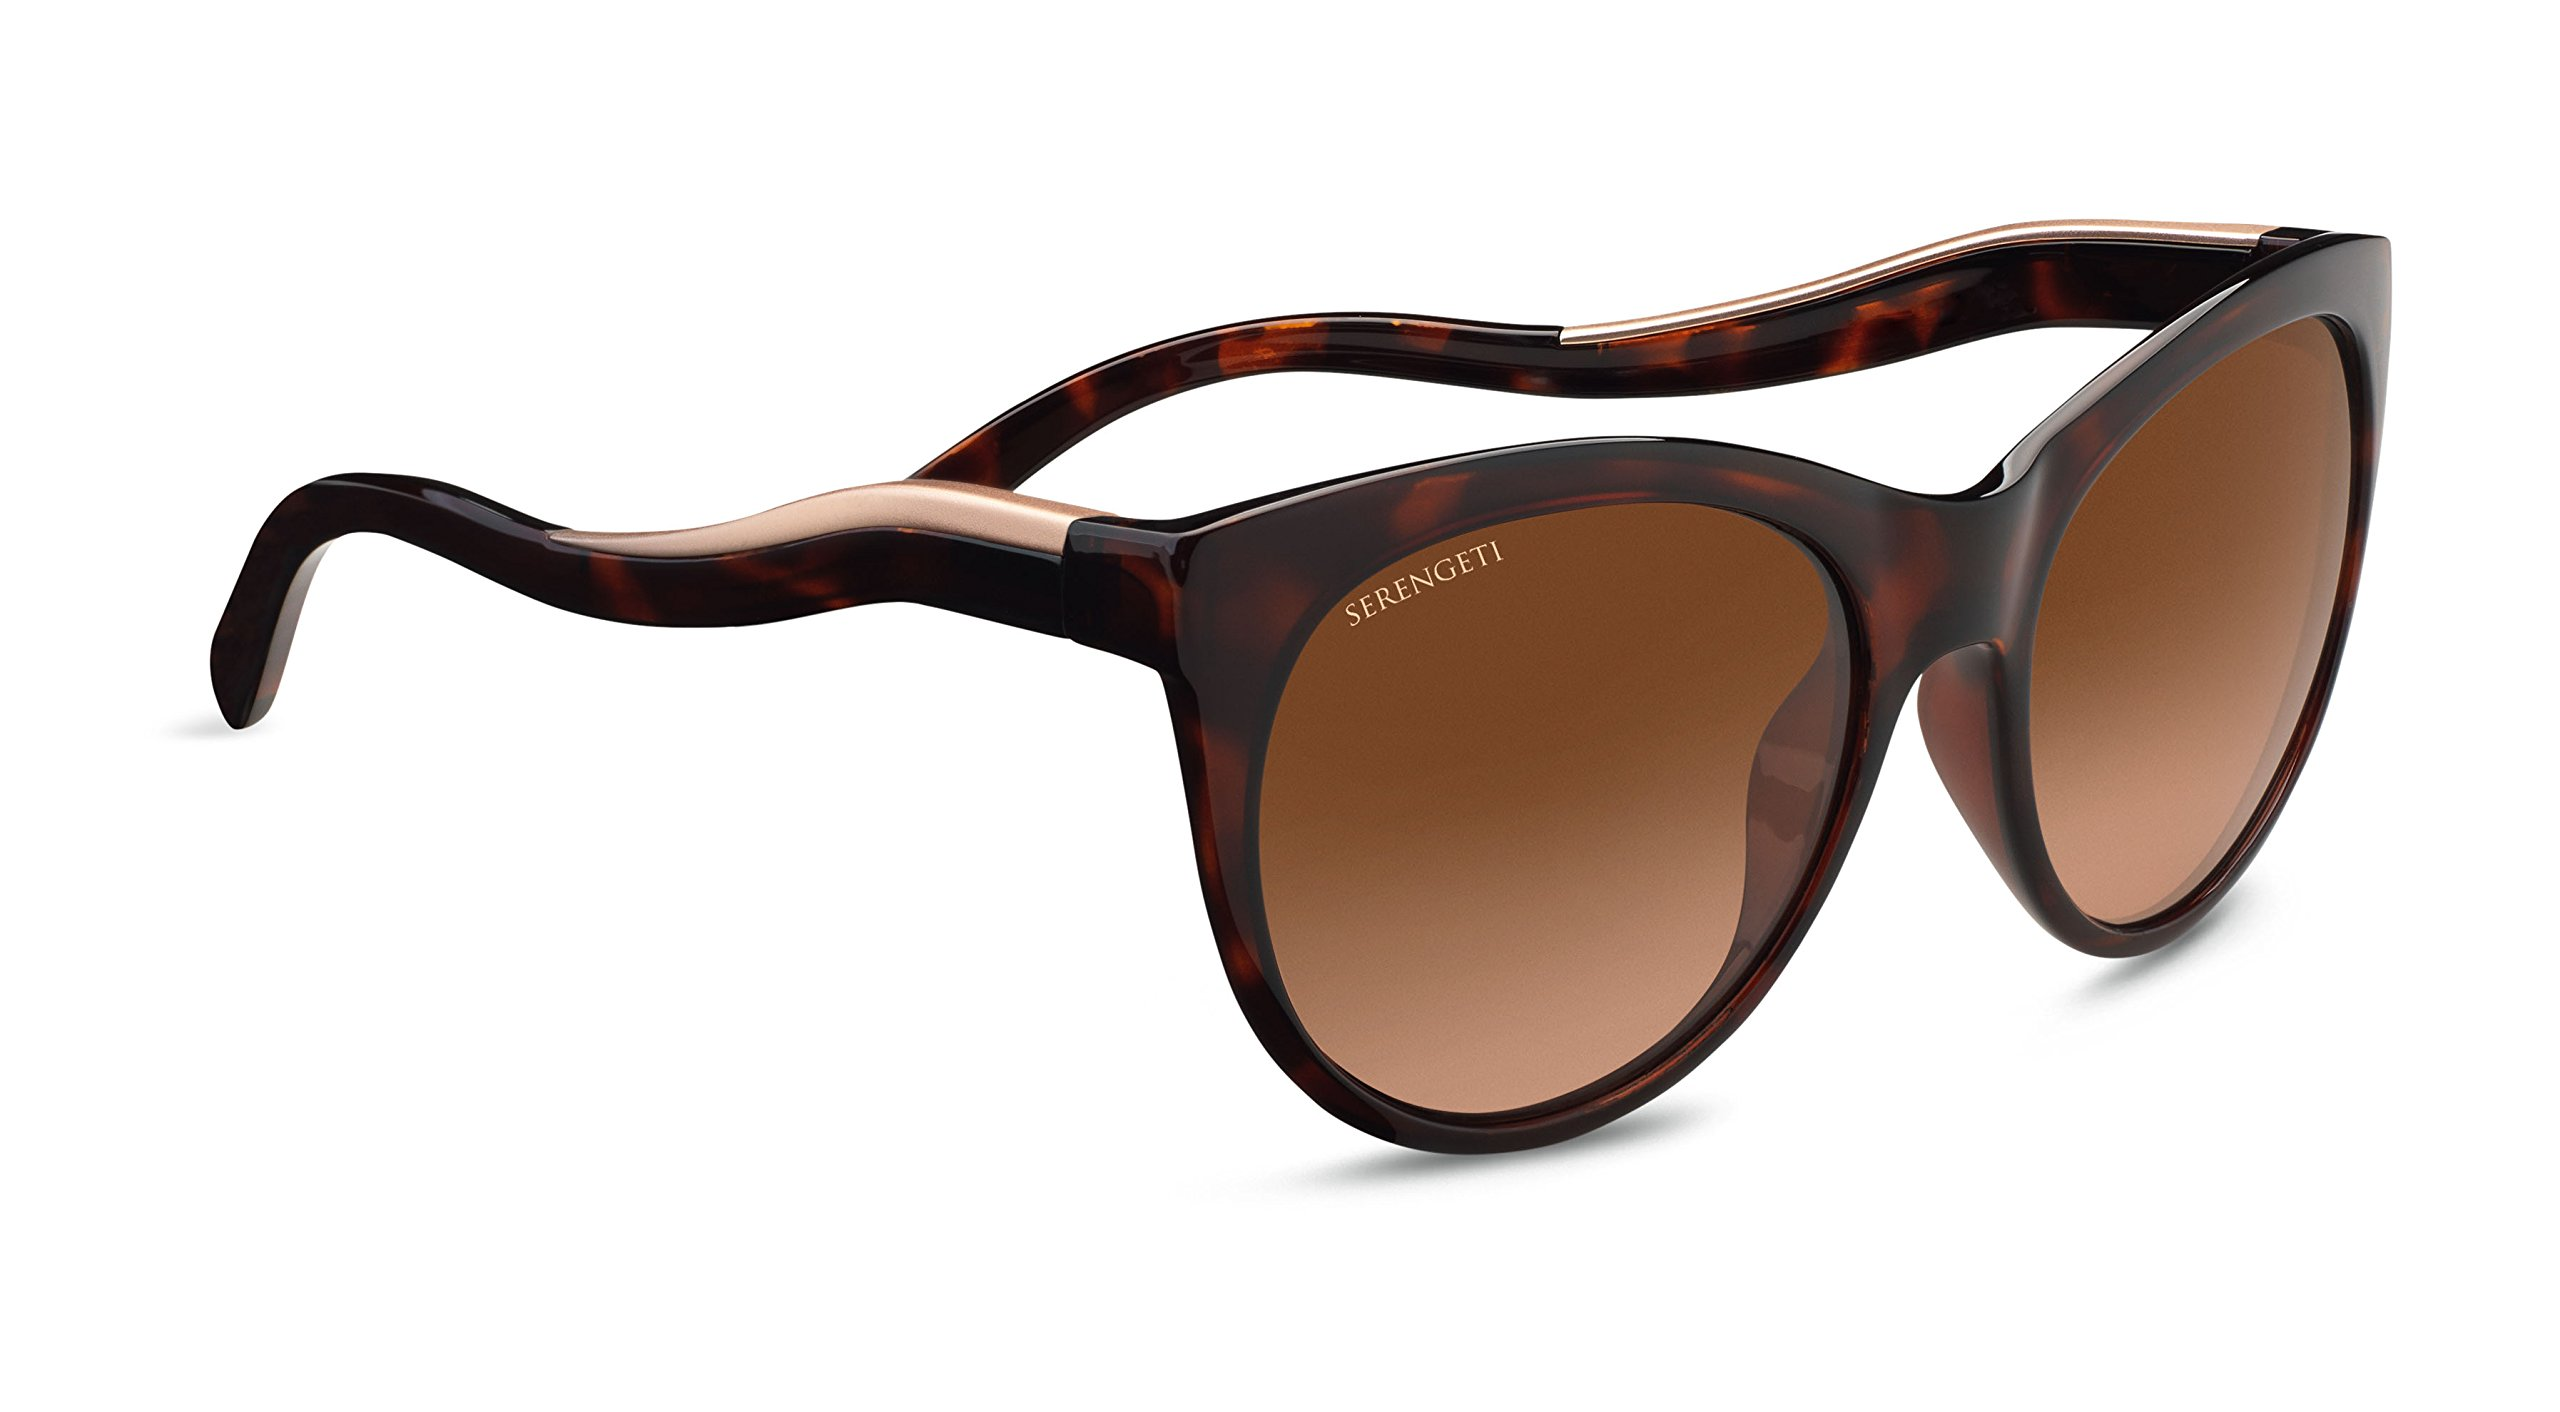 Serengeti Valentina Sunglasses Shiny Dark Tortoise Frame/Satin Rose Gold, Brown